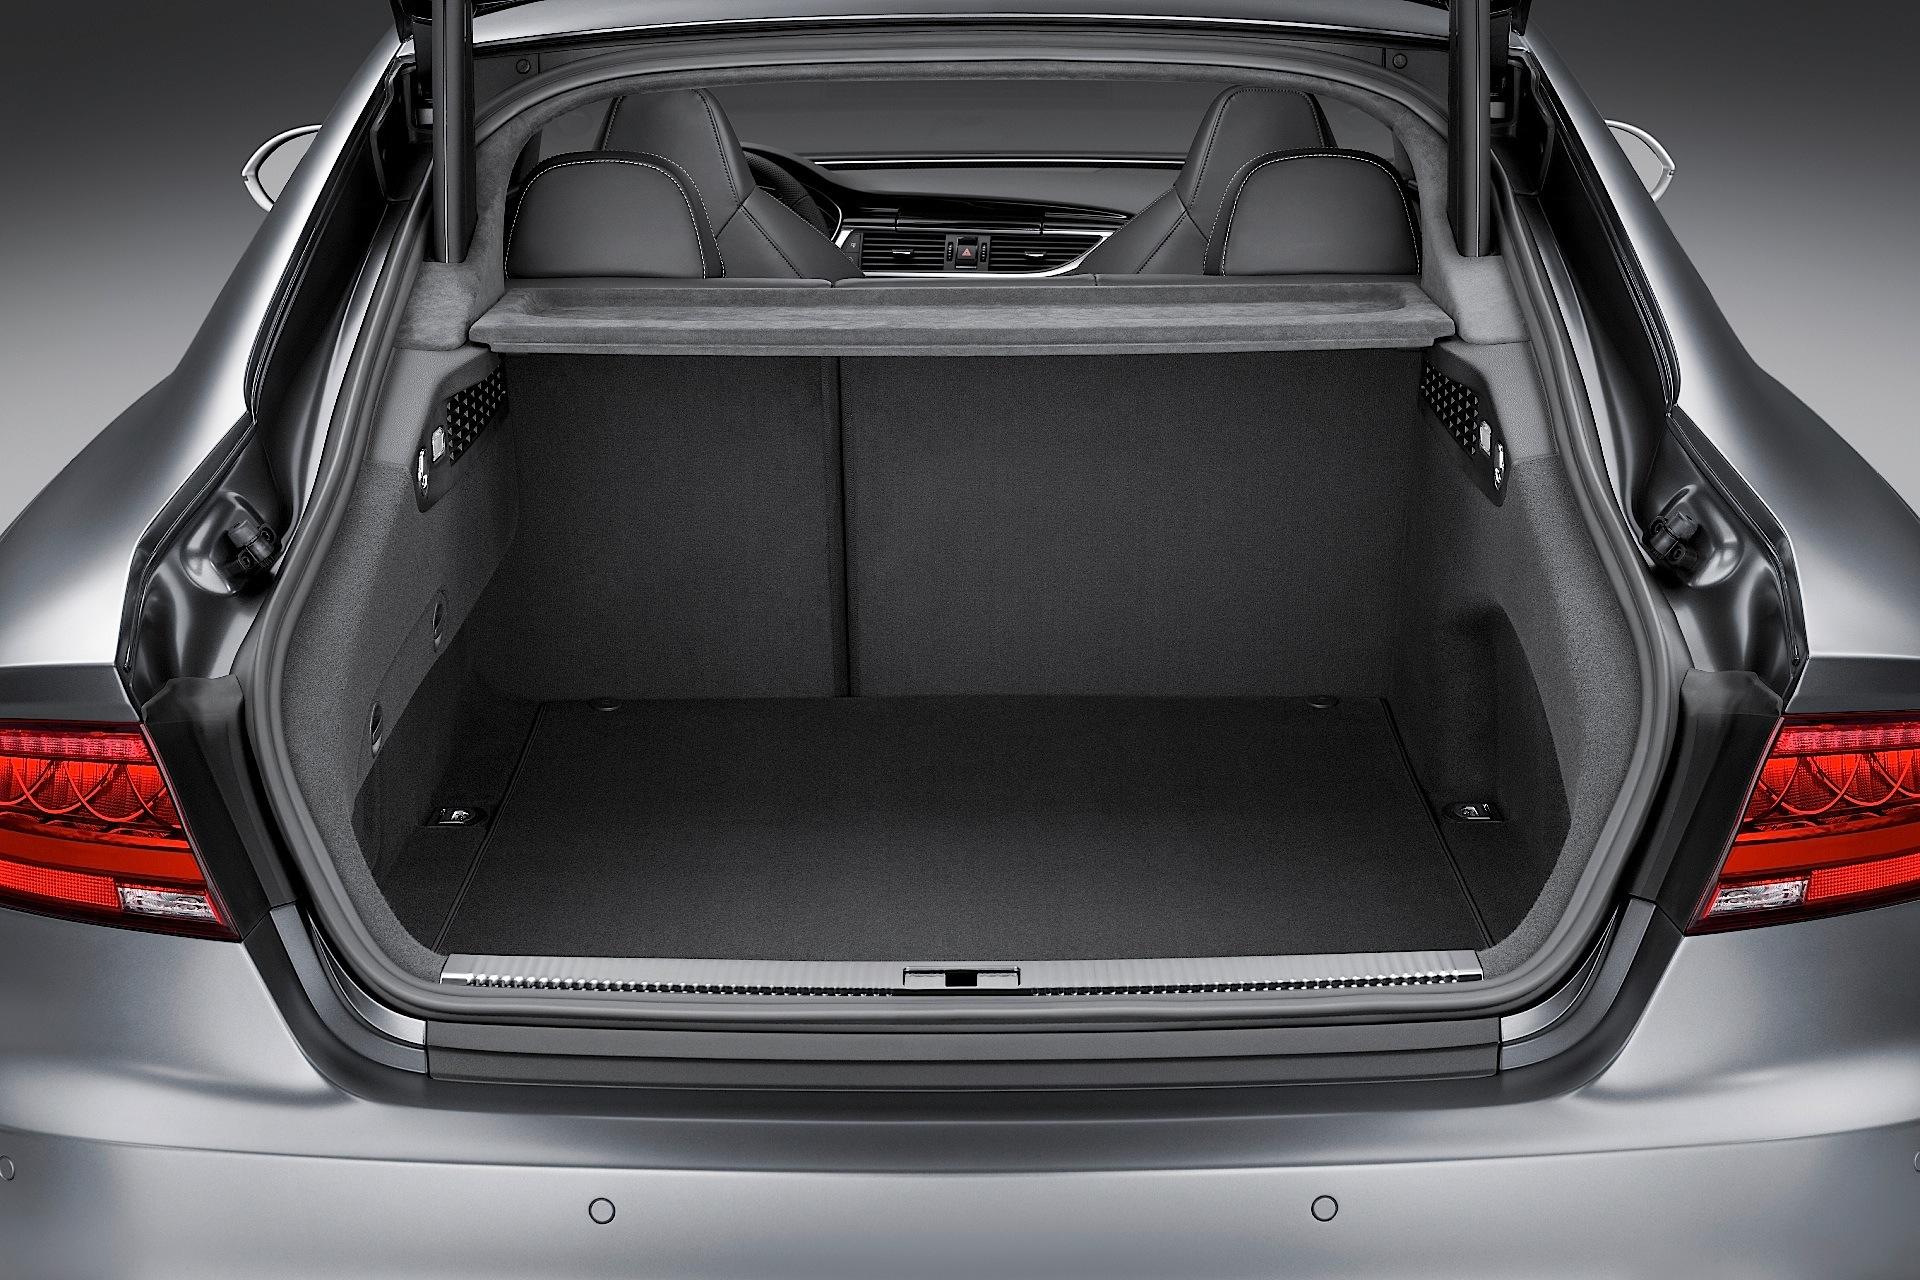 AUDI RS7 Sportback (2013 - Present)